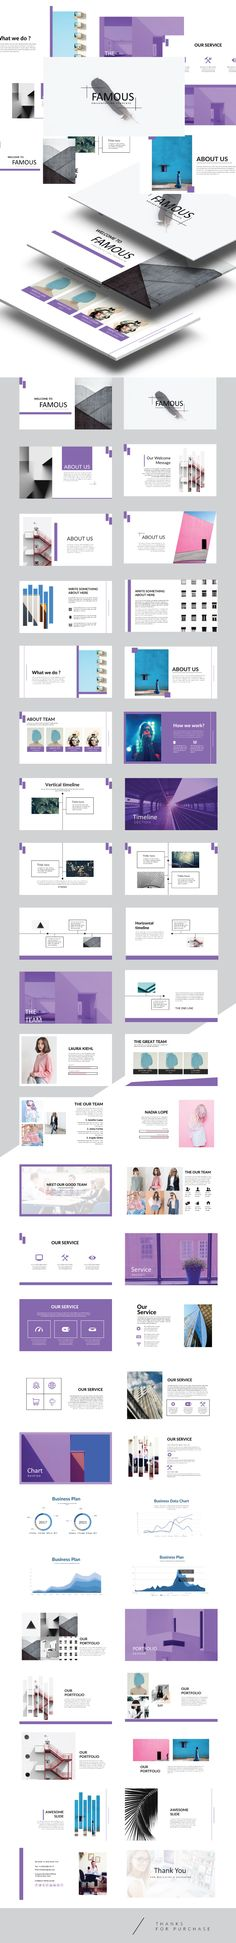 #Famous - Keynote #Presentation Template - Creative #Keynote Templates Download here: https://graphicriver.net/item/famous-keynote-presentation-template/19657820?ref=alena994